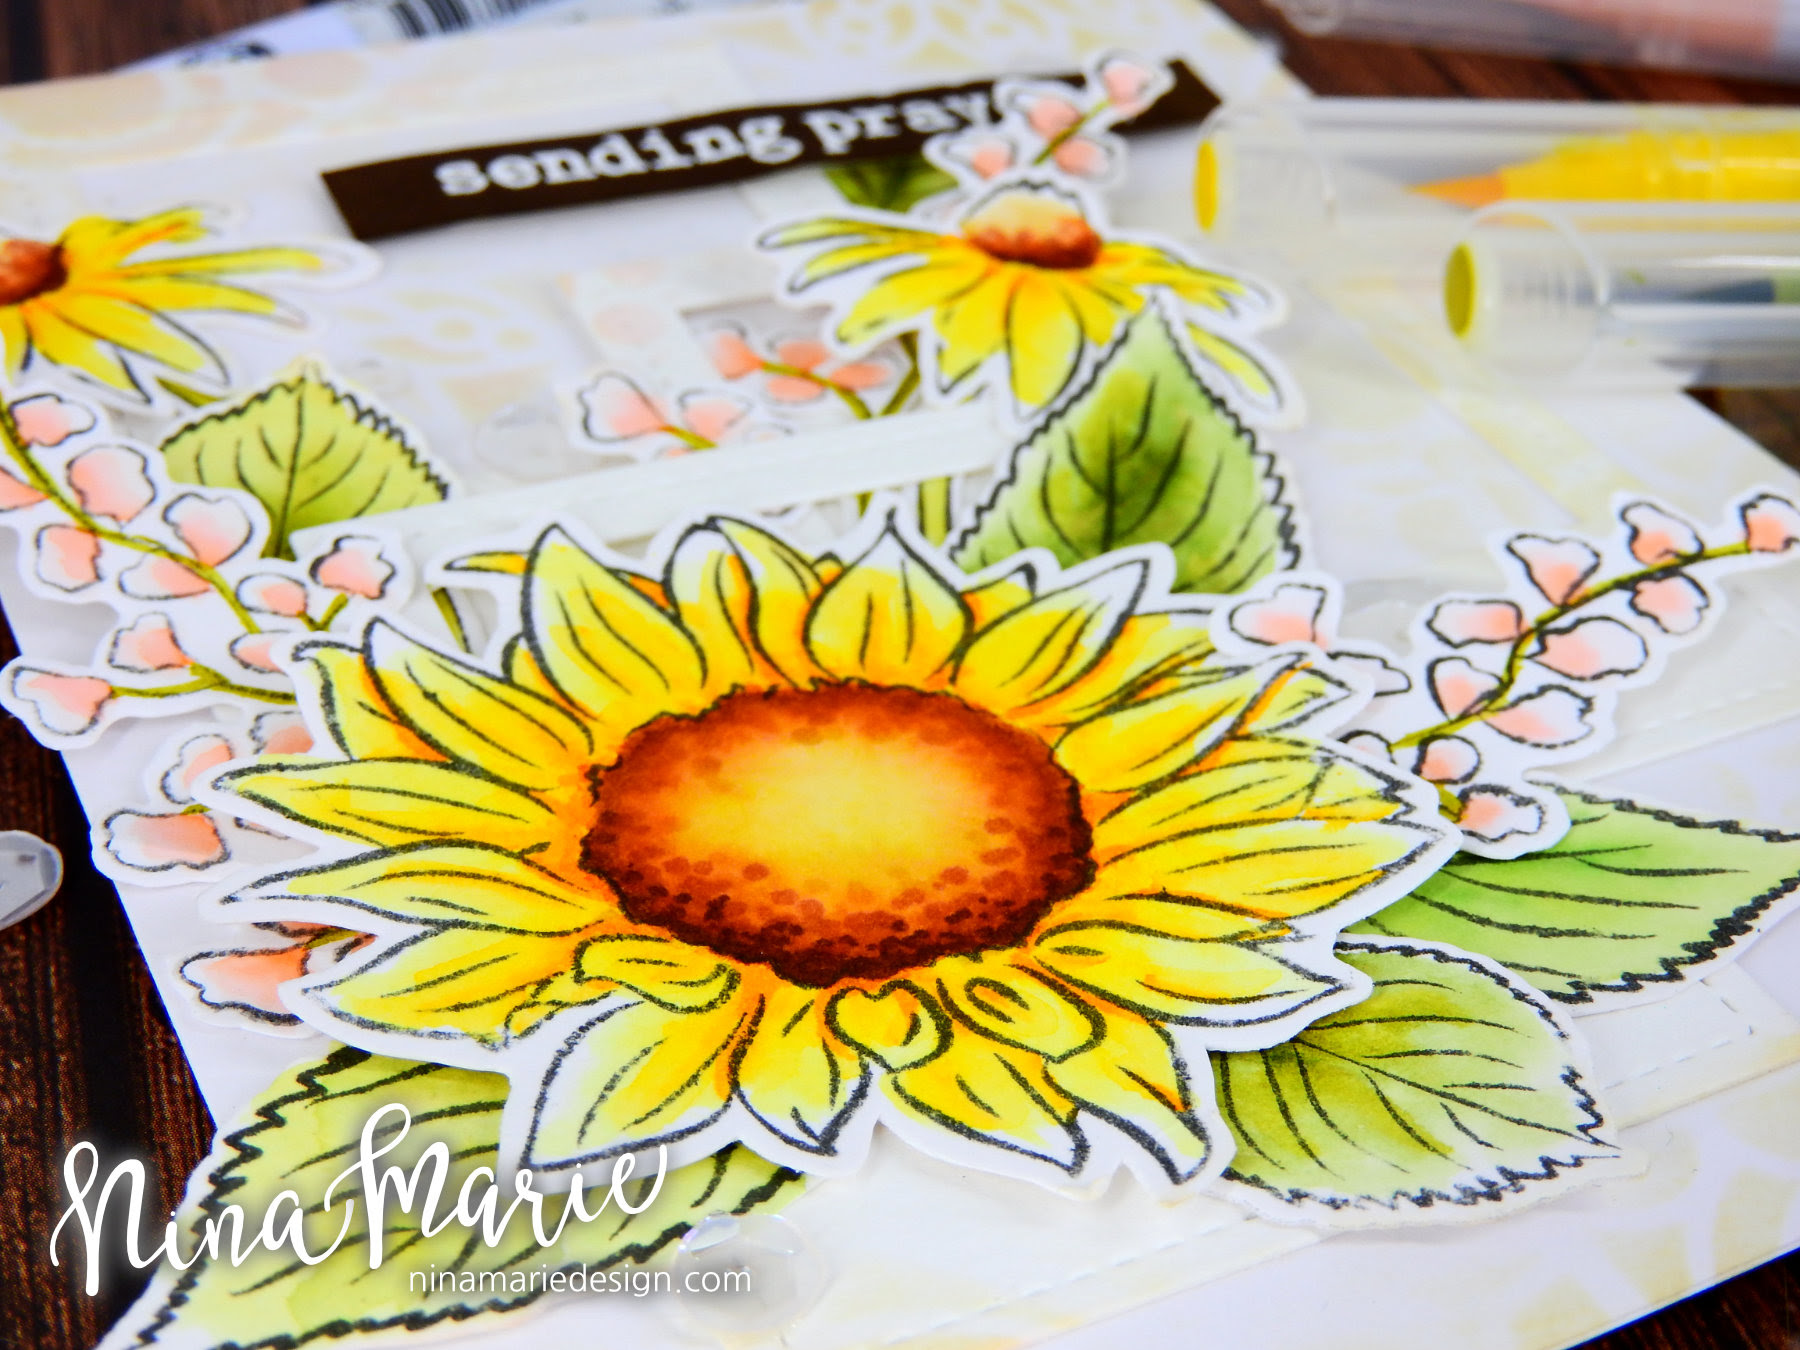 Creating Floral Arrangements_1